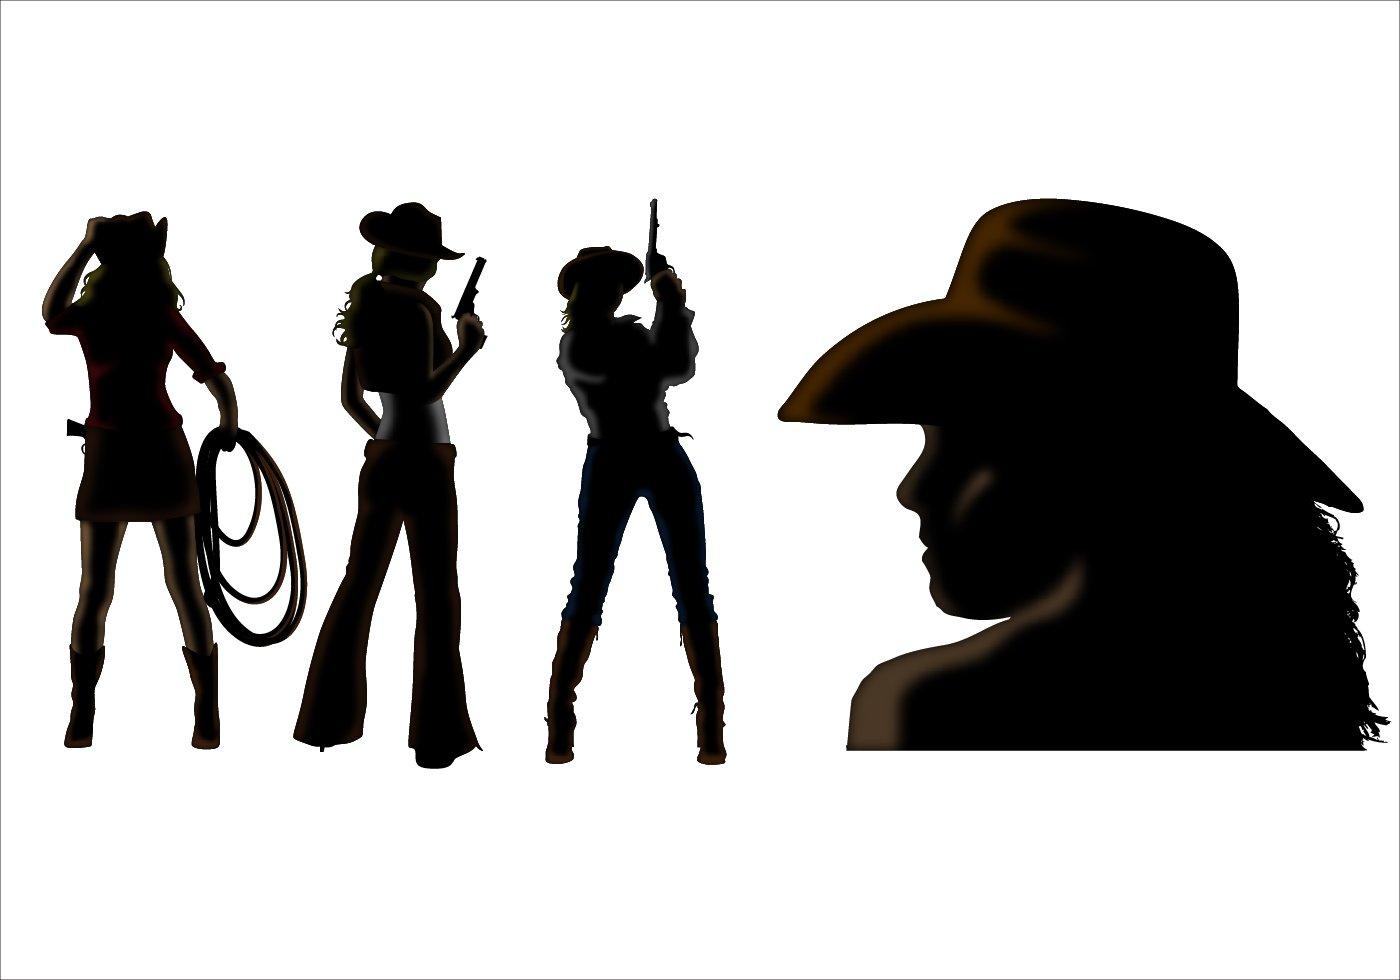 cowboy silhouette images clipart best